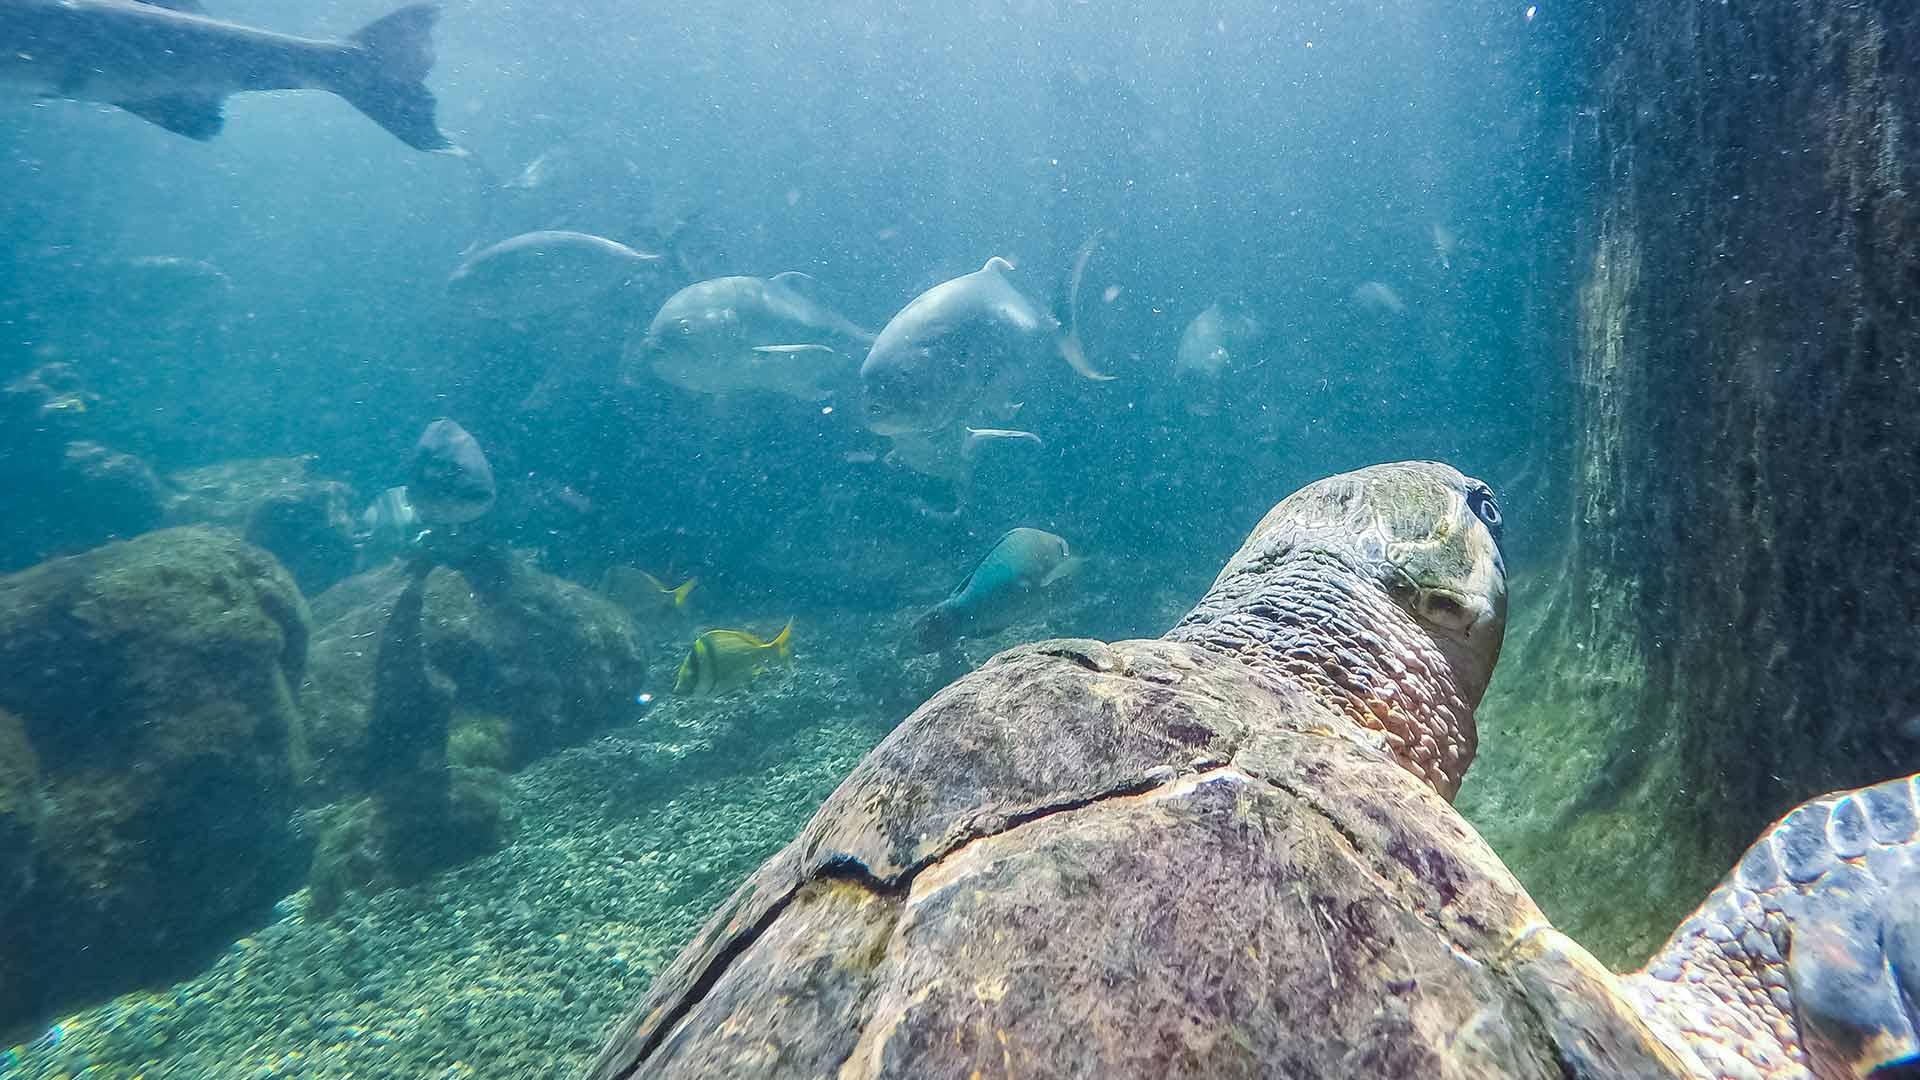 Image of sea turtle swimming